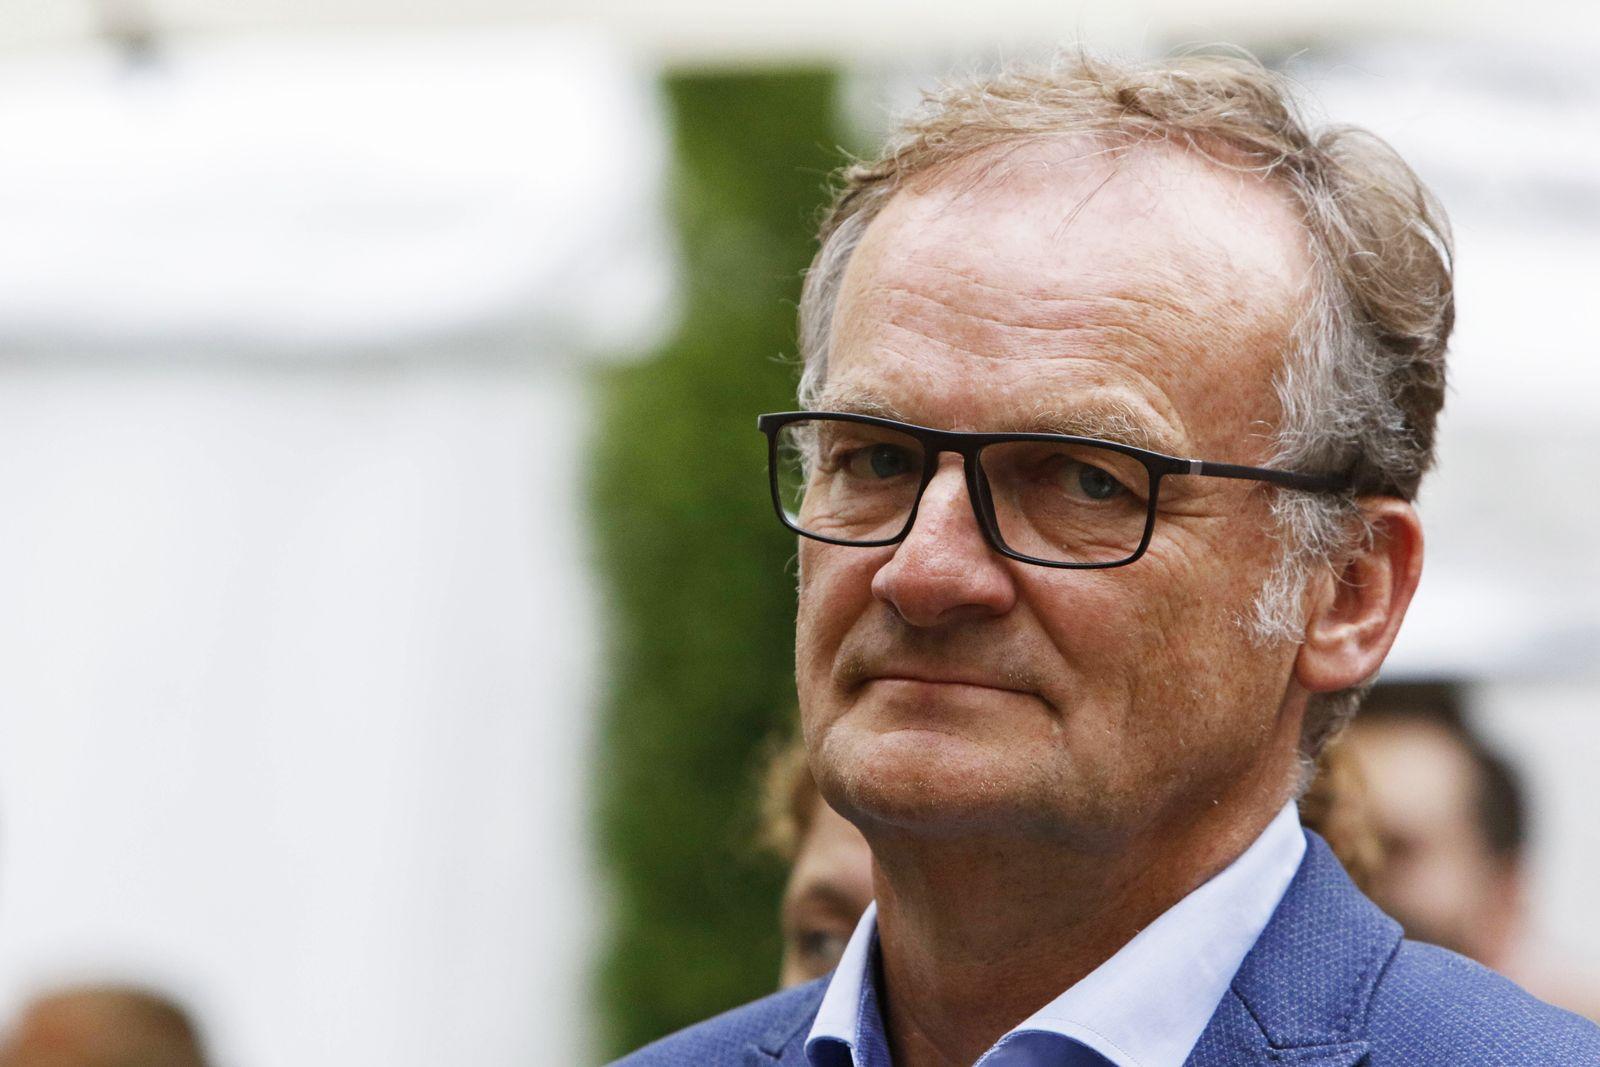 Germany: Nibelungen-Festspiele 2019 premiere TV host Frank Plasberg is pictured before the premiere of the Nibelungen-